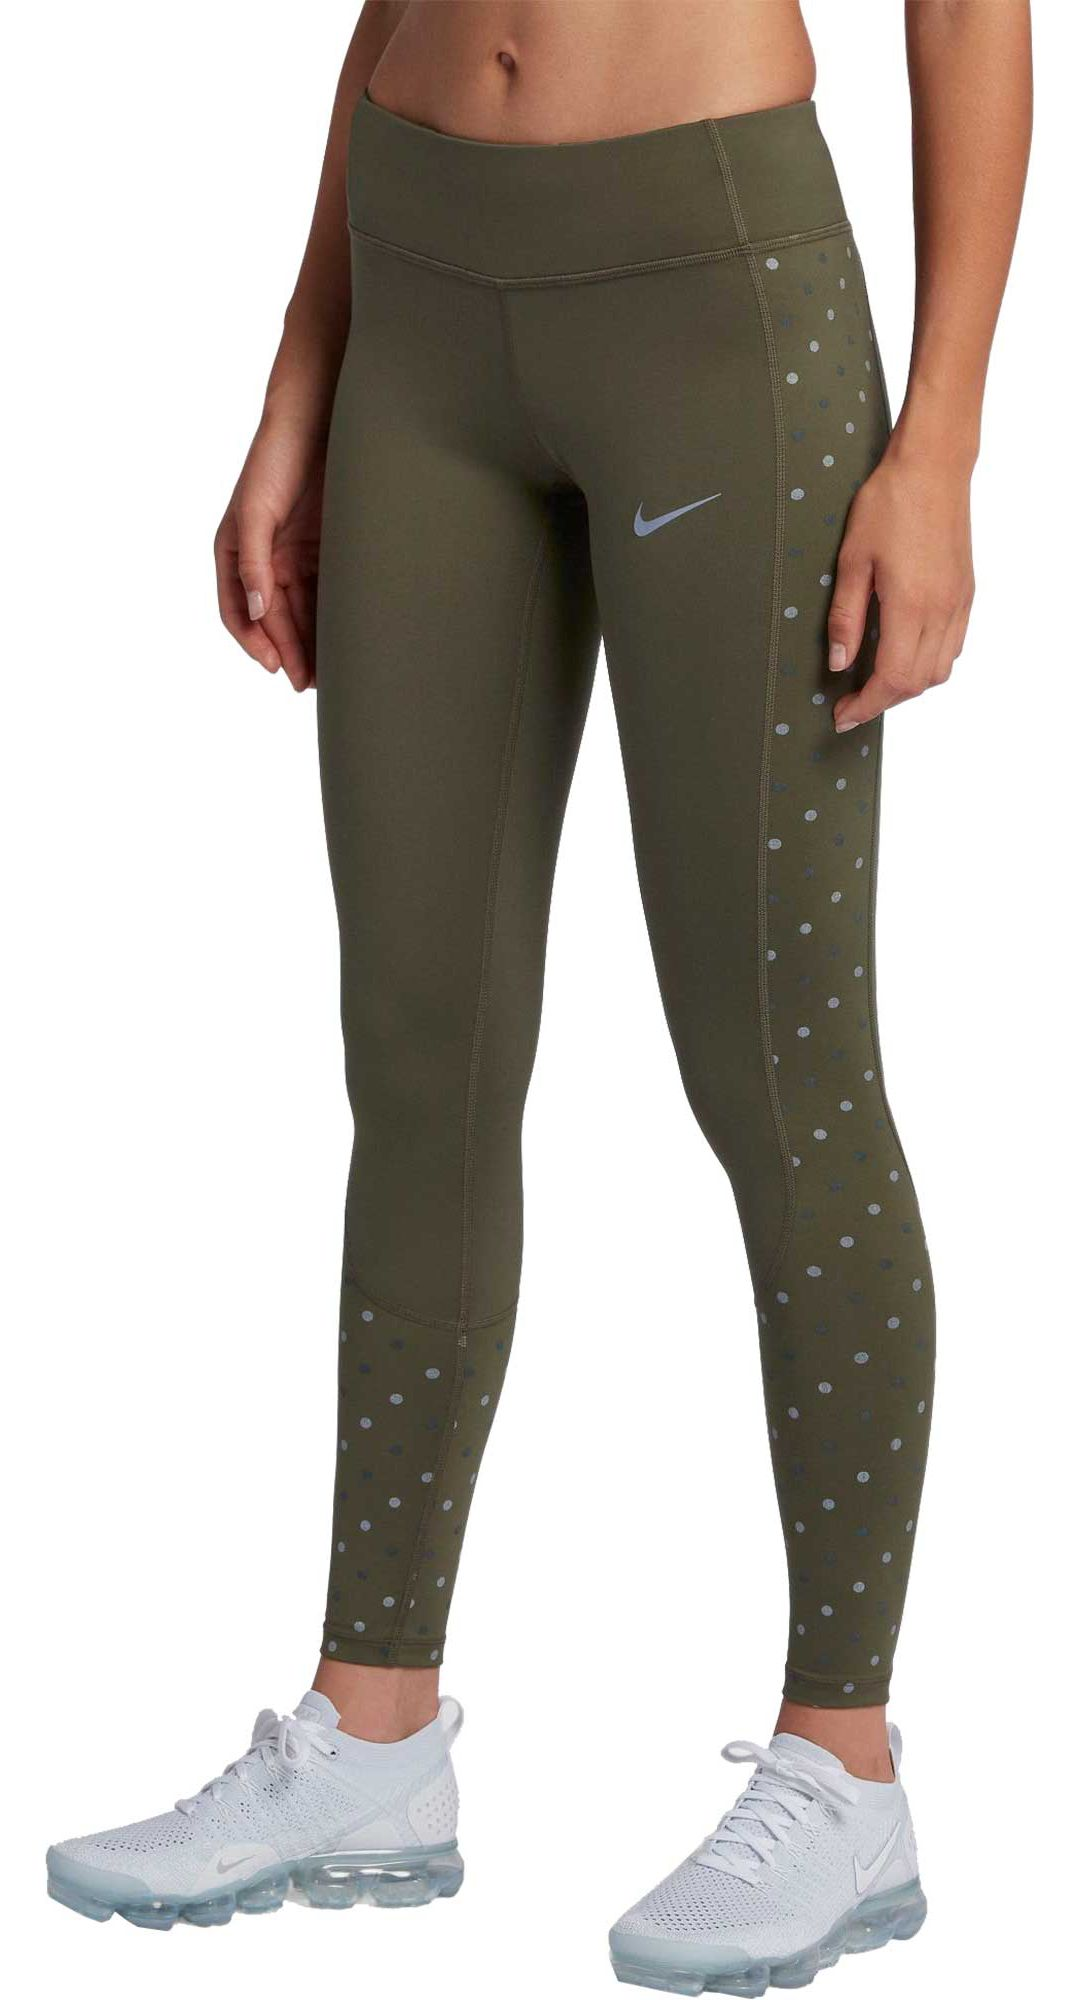 cc6962197025b4 Nike Women's Racer Flash Running Tights. noImageFound. Previous